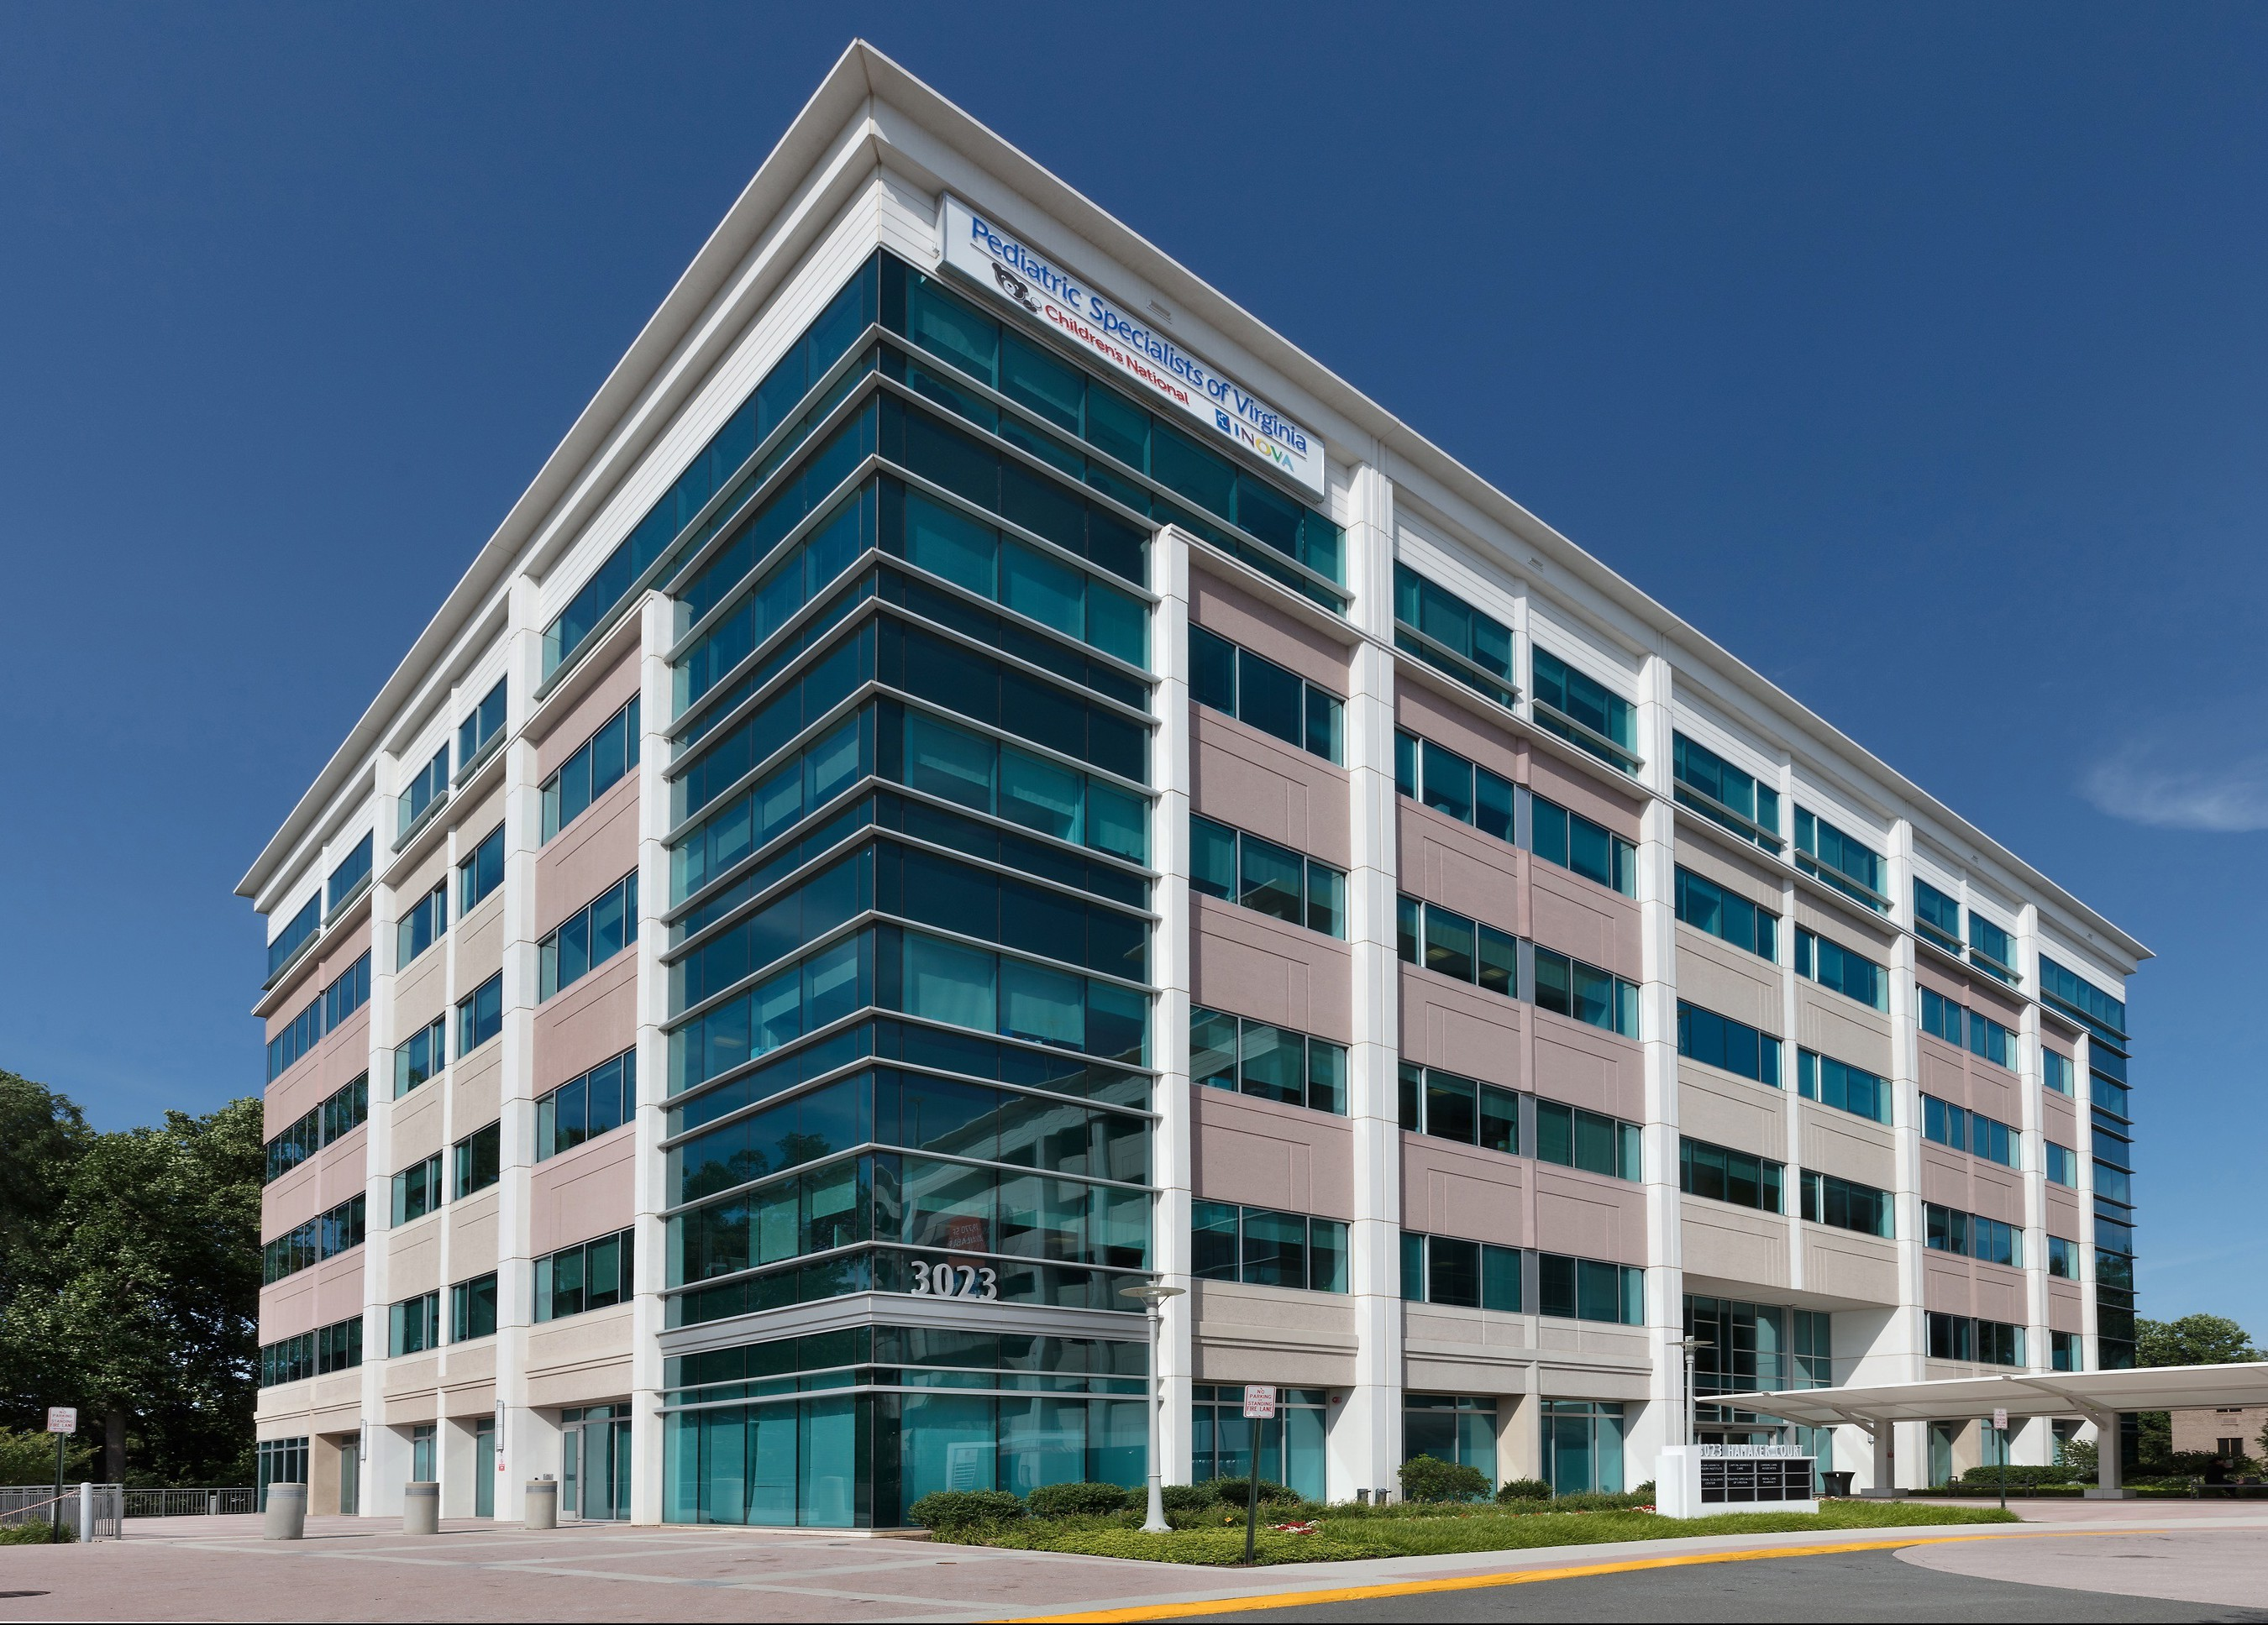 Merrifield-Fairfax Medical Campus, Fairfax, Va.